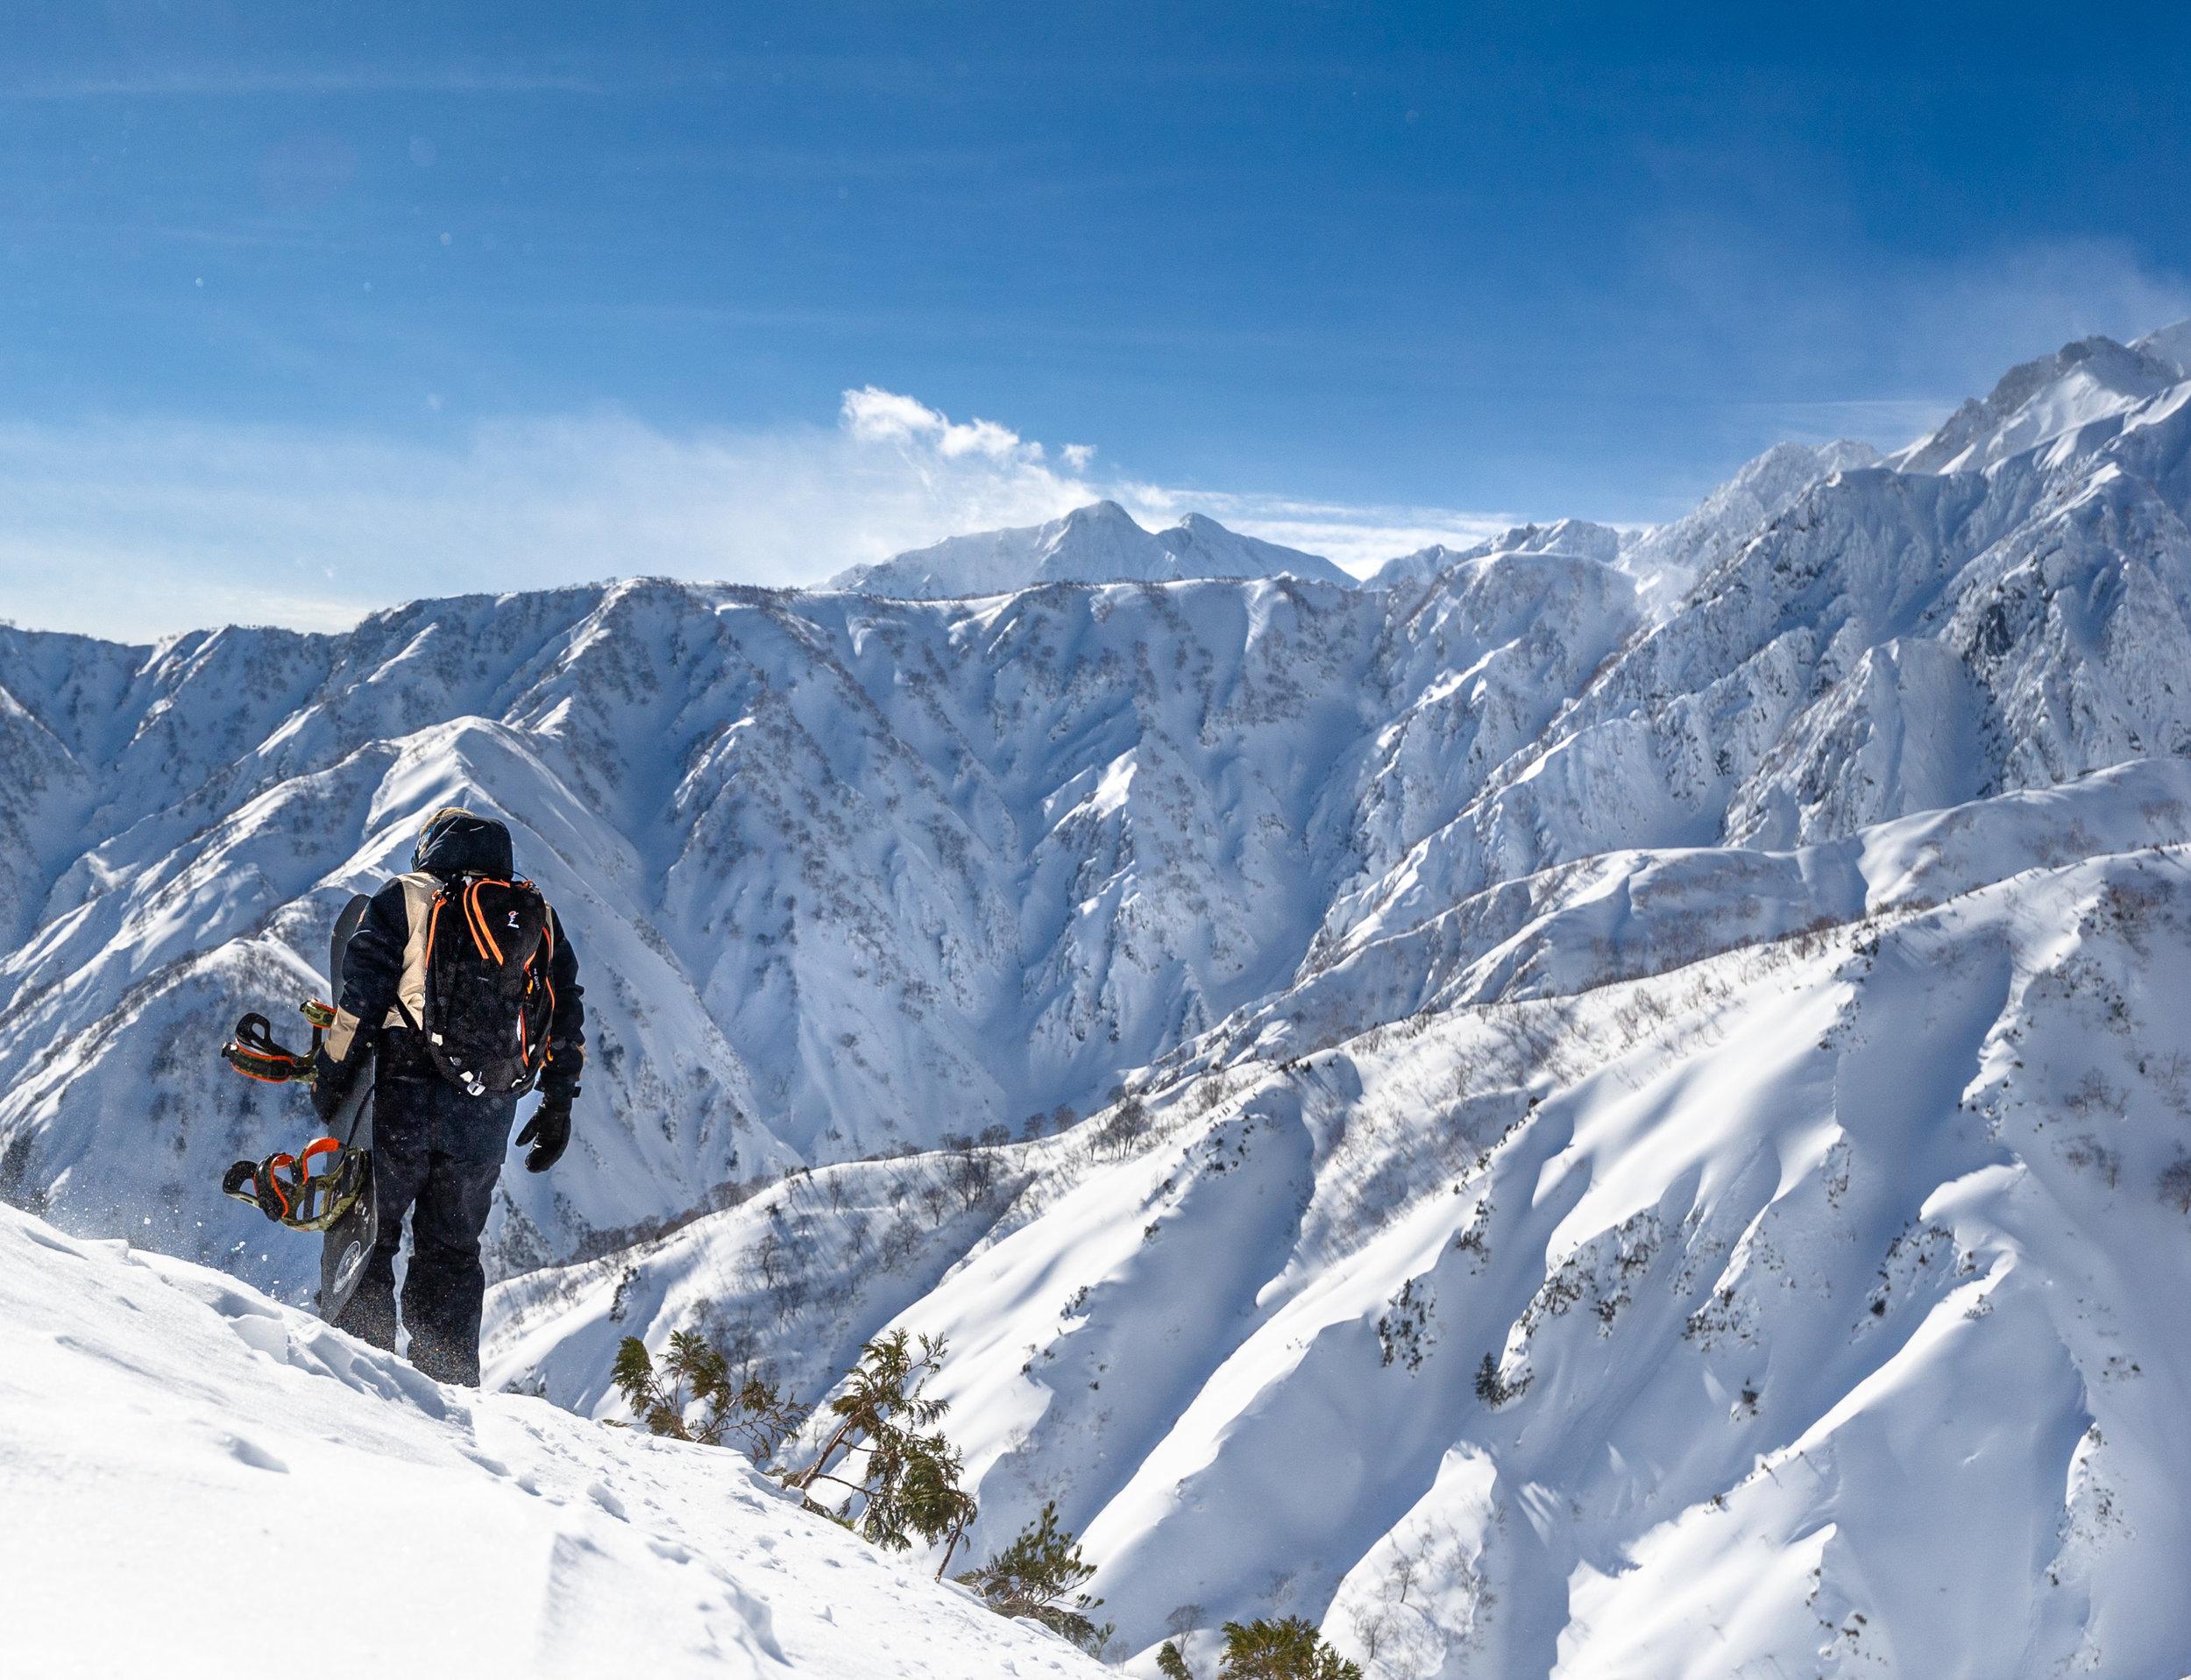 JGasaway_Skiing-24.jpg